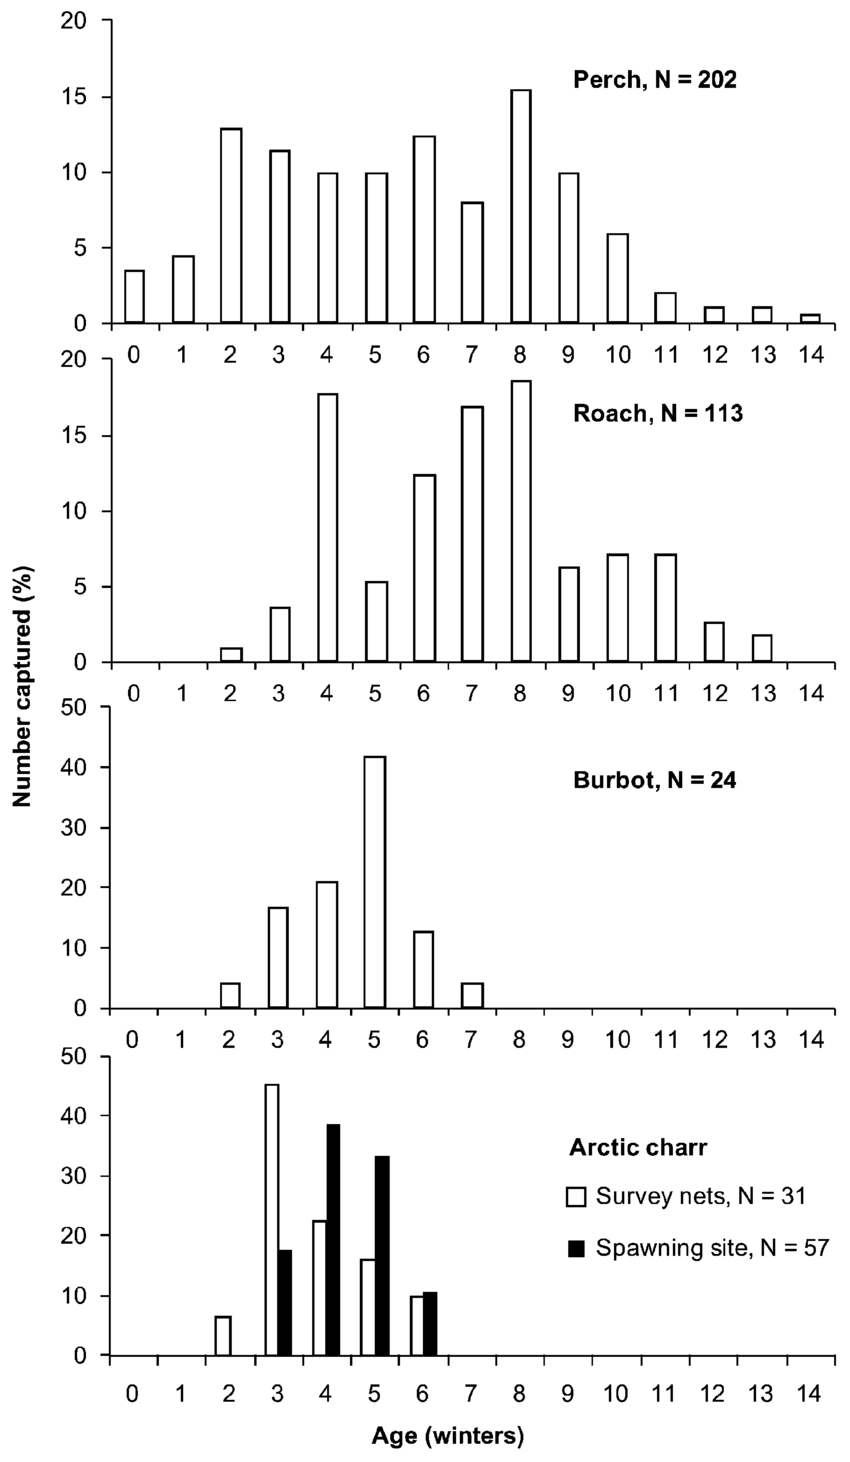 medium resolution of age distribution of perch perca fluviatilis roach rutilus rutilus burbot